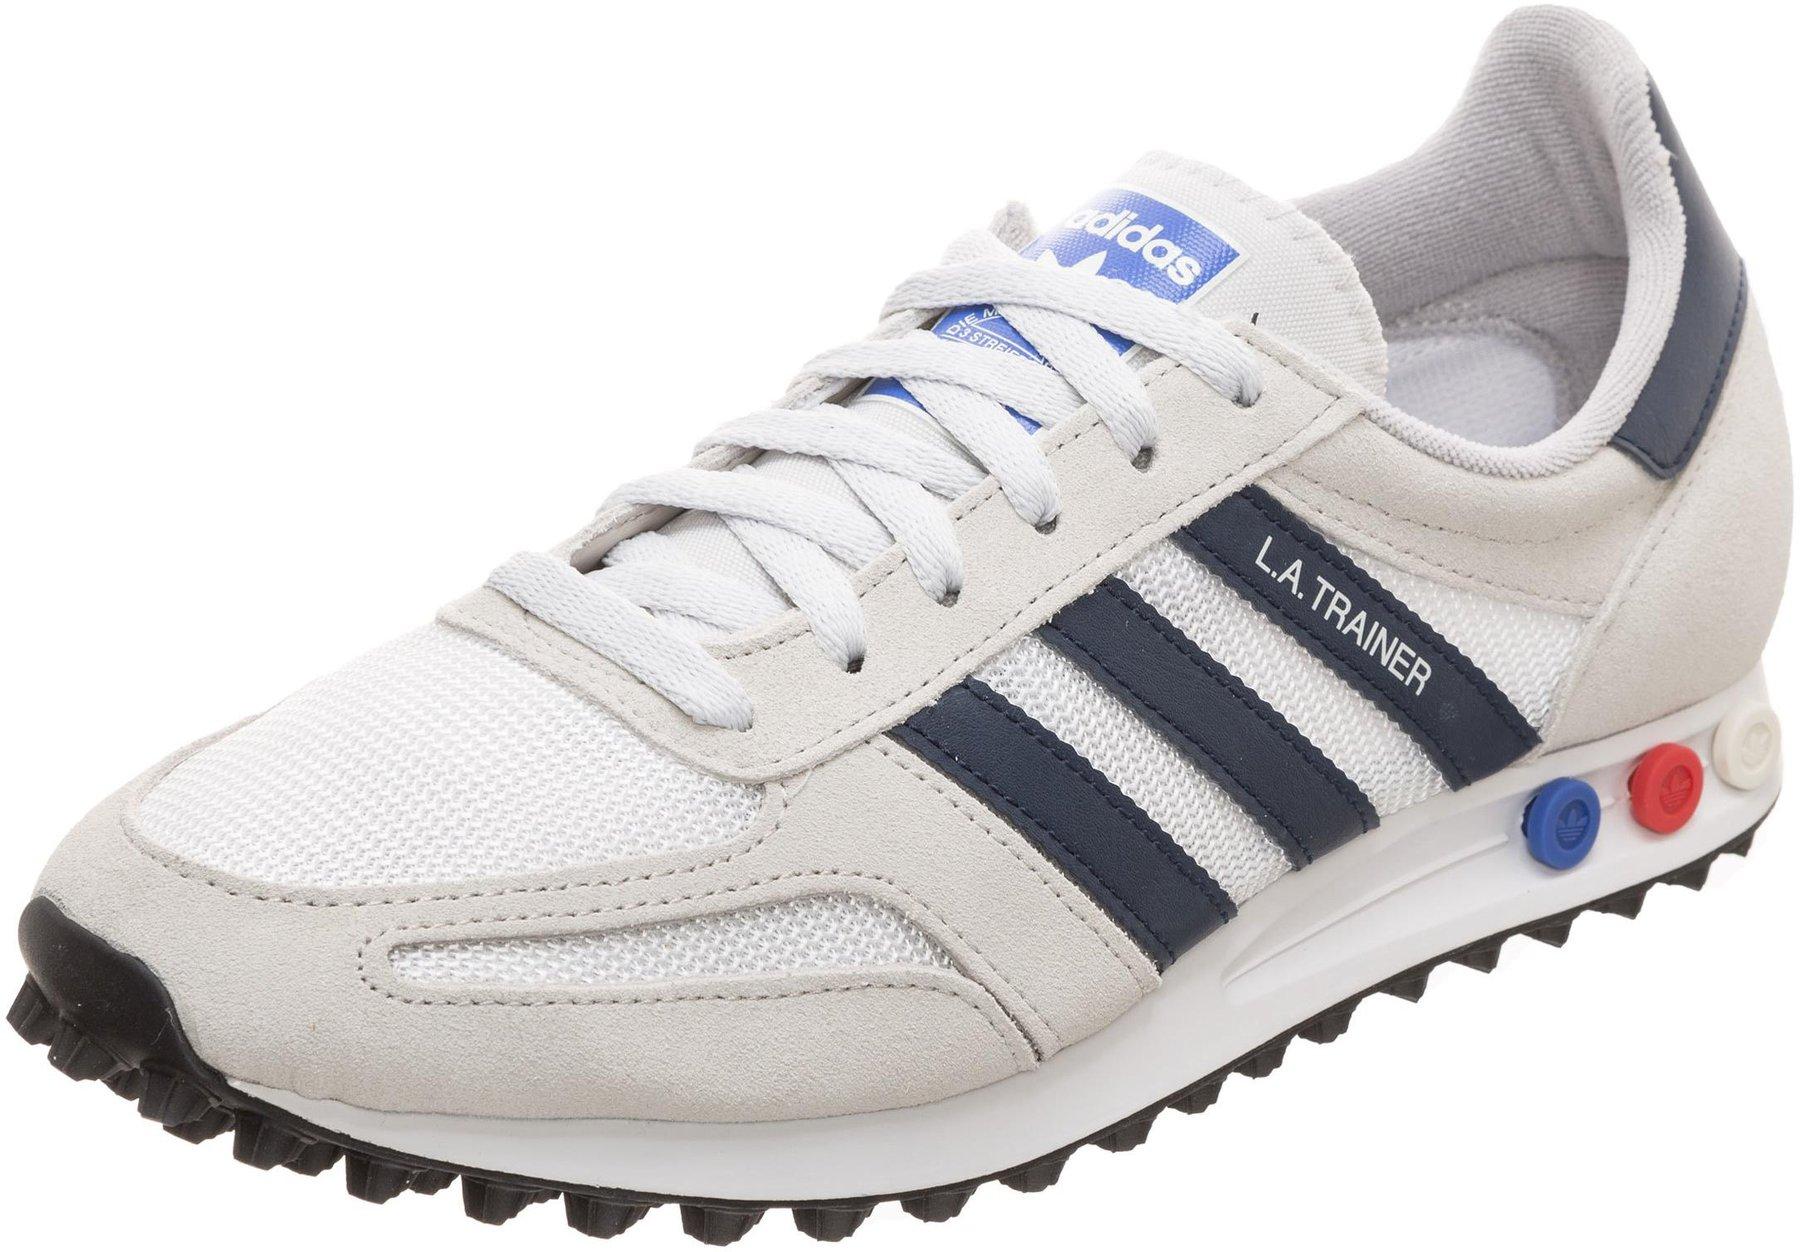 89a0f1196301d3 Adidas LA Trainer ab 63